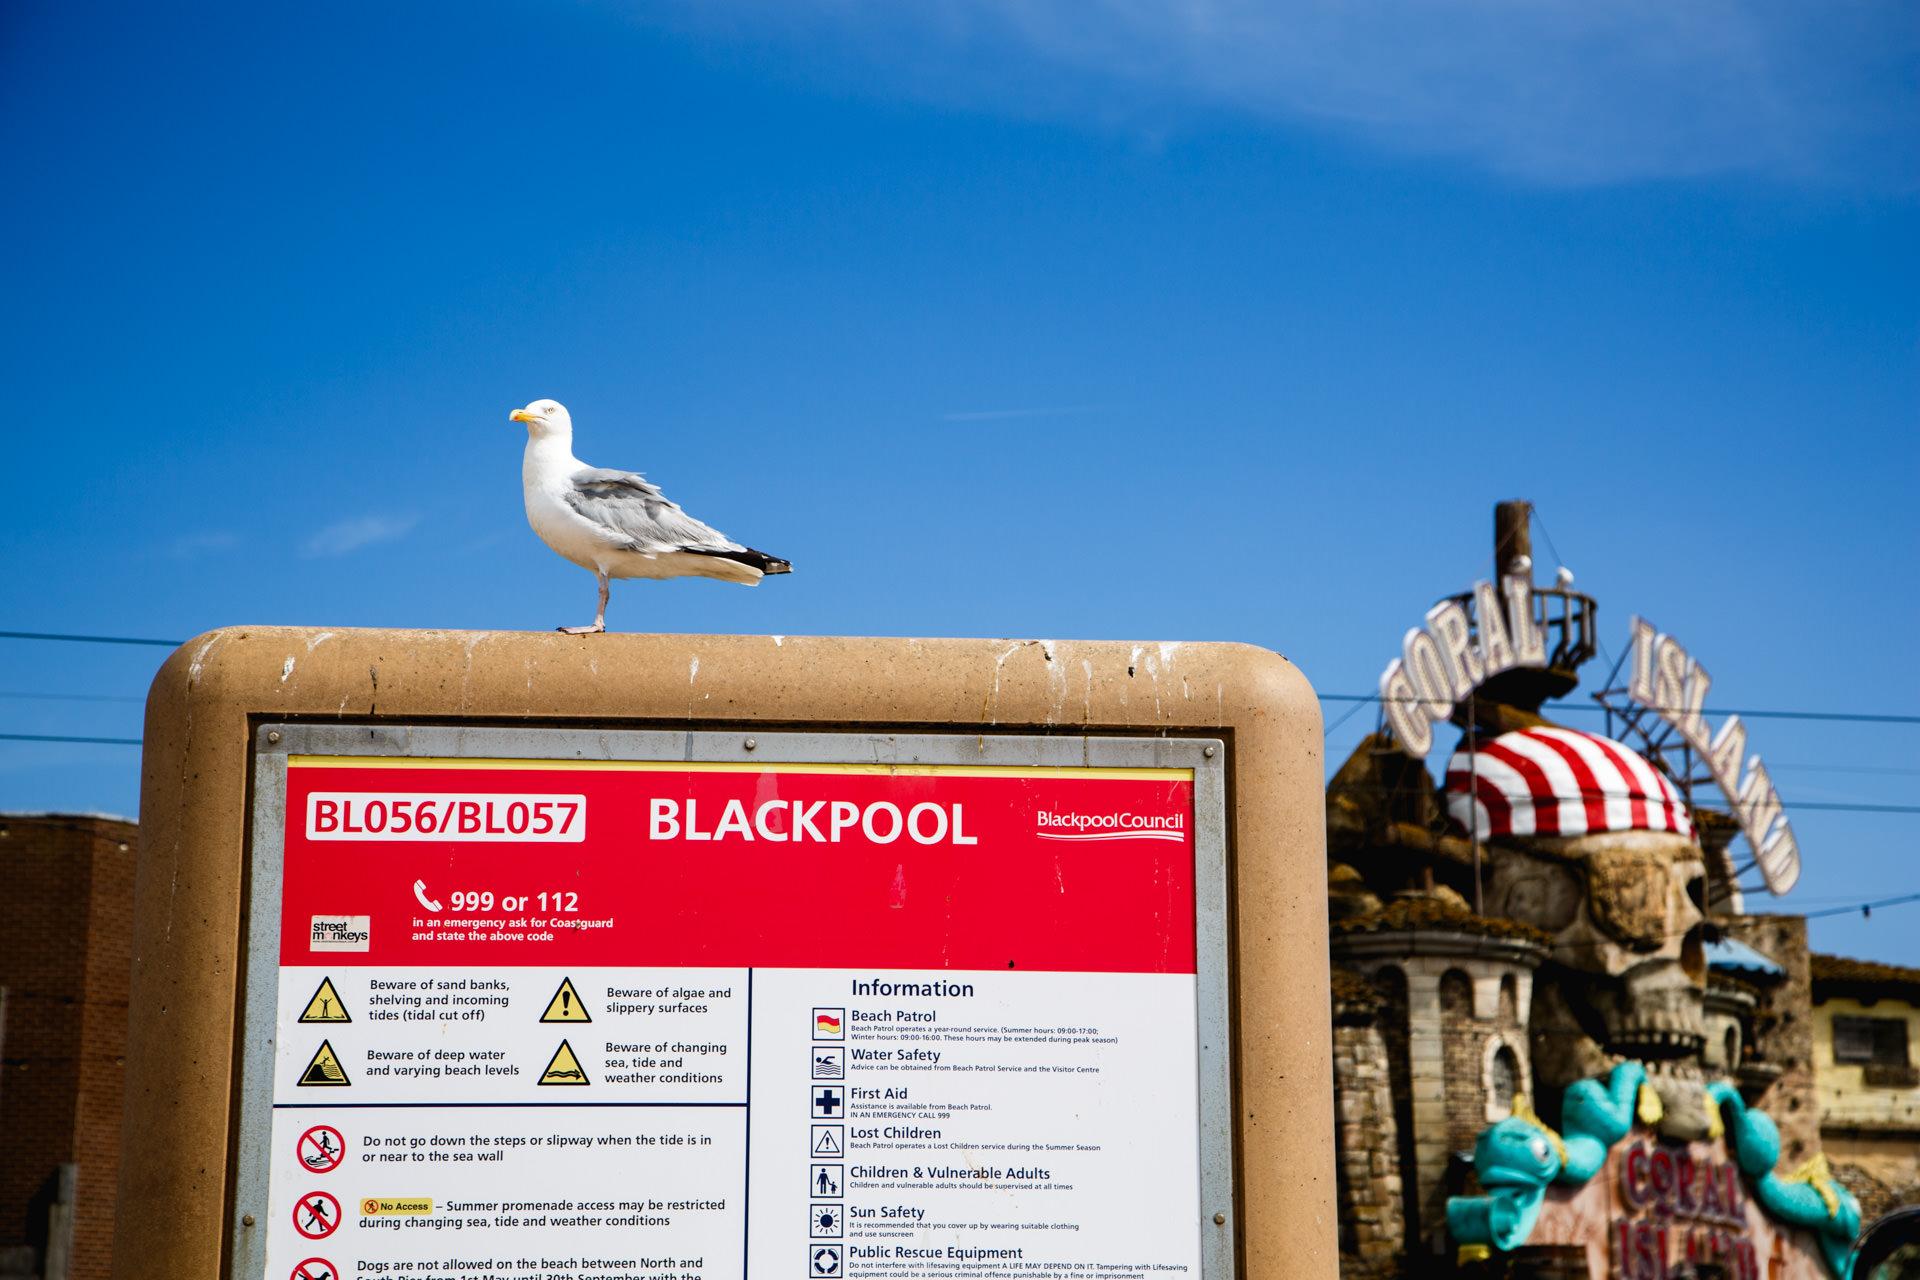 Andrew Wilson Photography Blackpool (21) Seagull.jpg